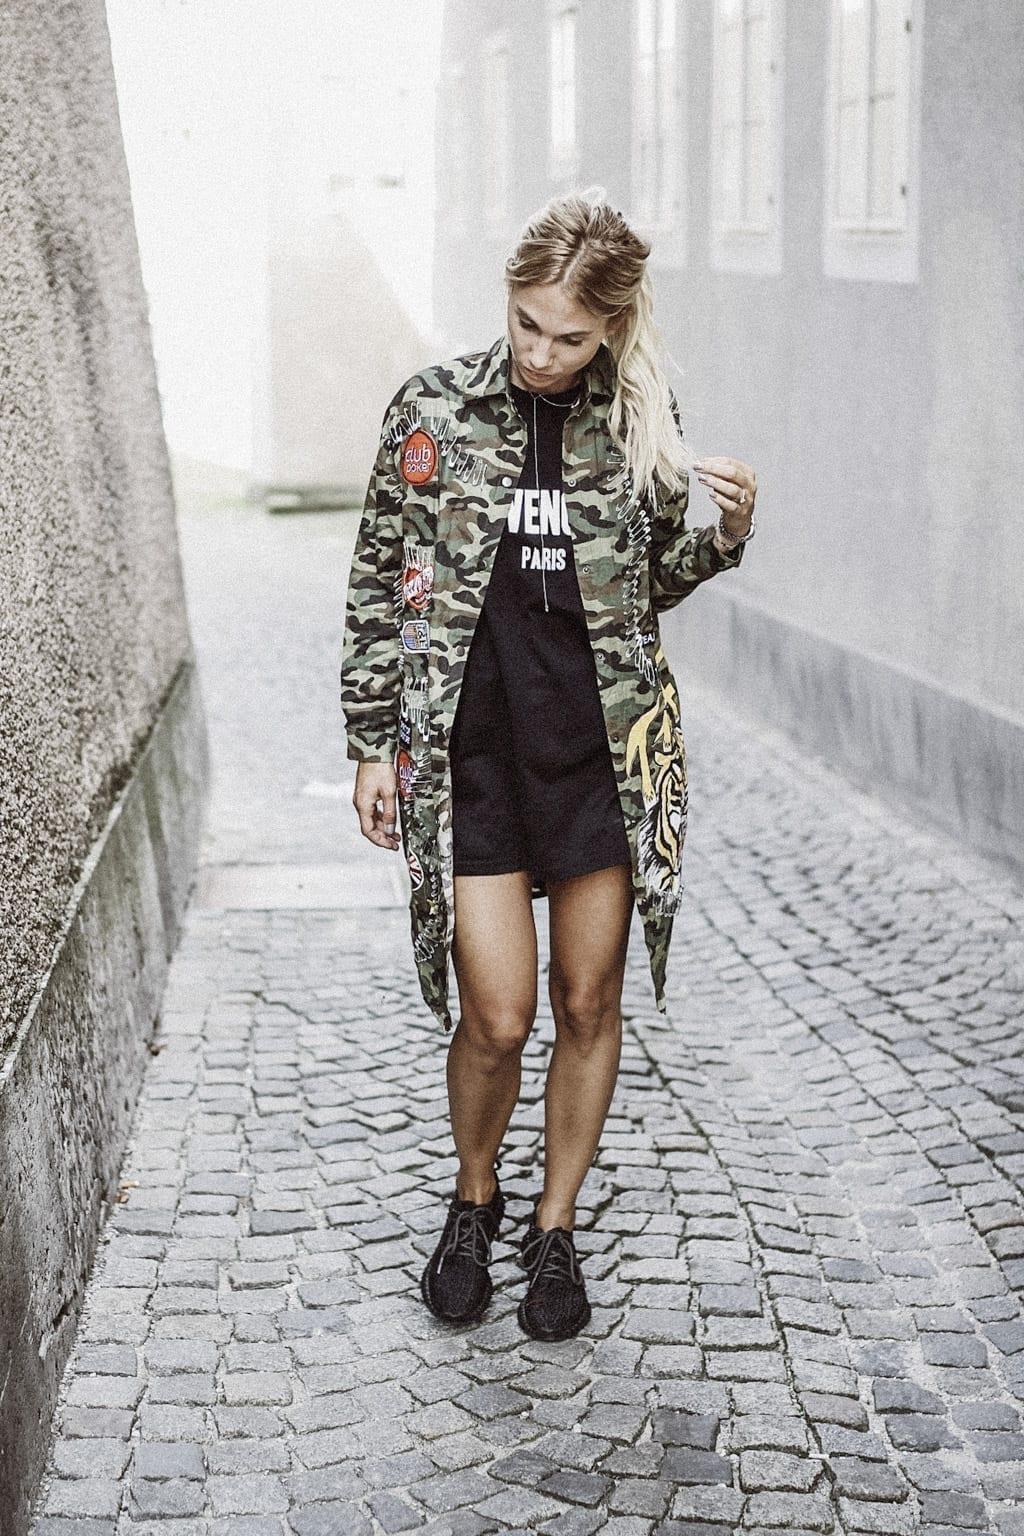 CK-1606_salzburg-fashion-street-style-look-magazine-karin-kaswurm-electric-love-2016-festival-camouflage-military-jacket-8937